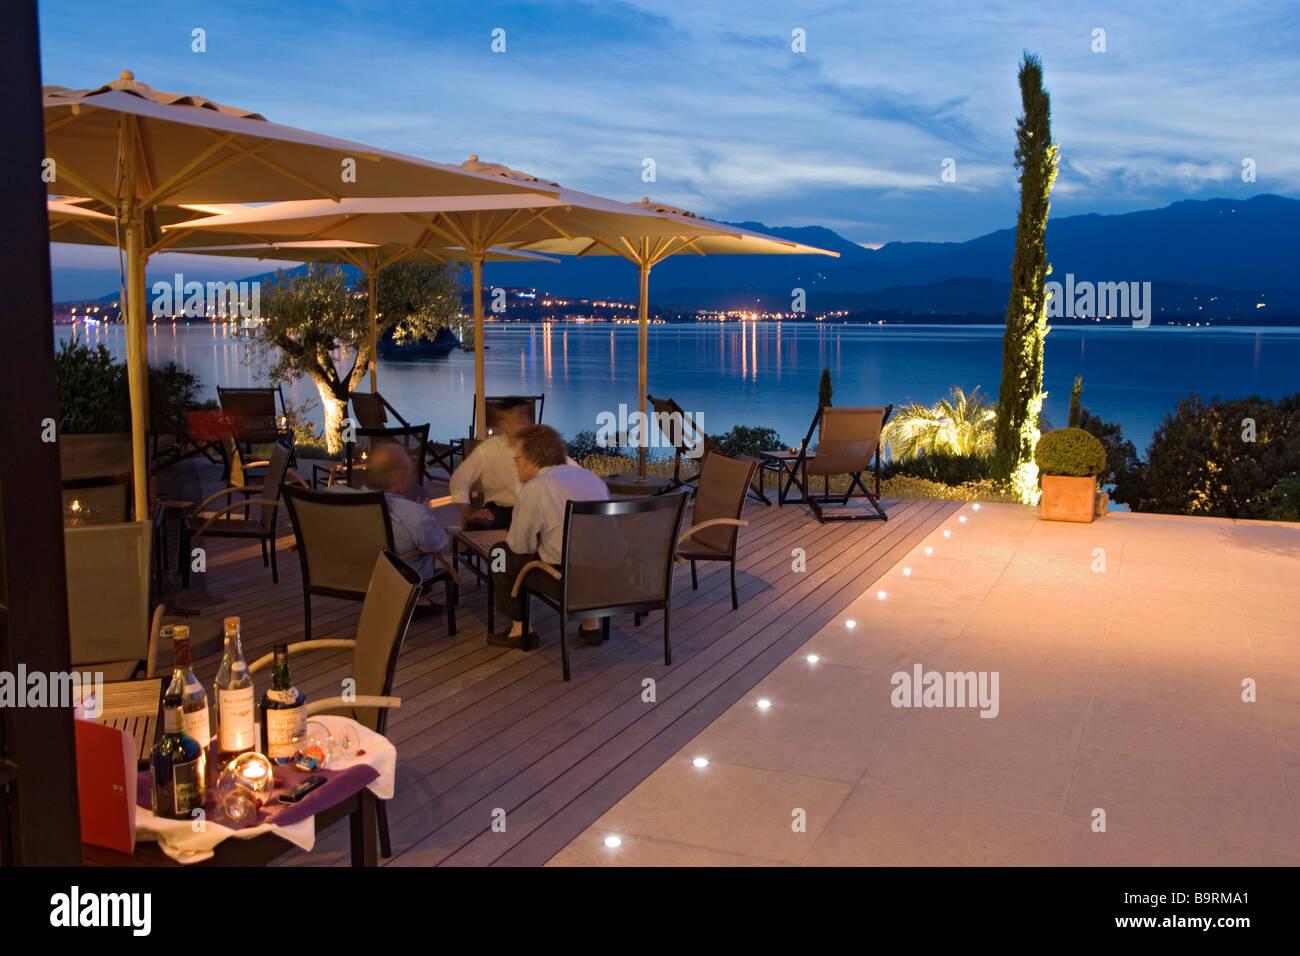 France corse du sud porto vecchio casadelmar hotel restaurant stock photo 23263129 alamy - Restaurant corse du sud ...